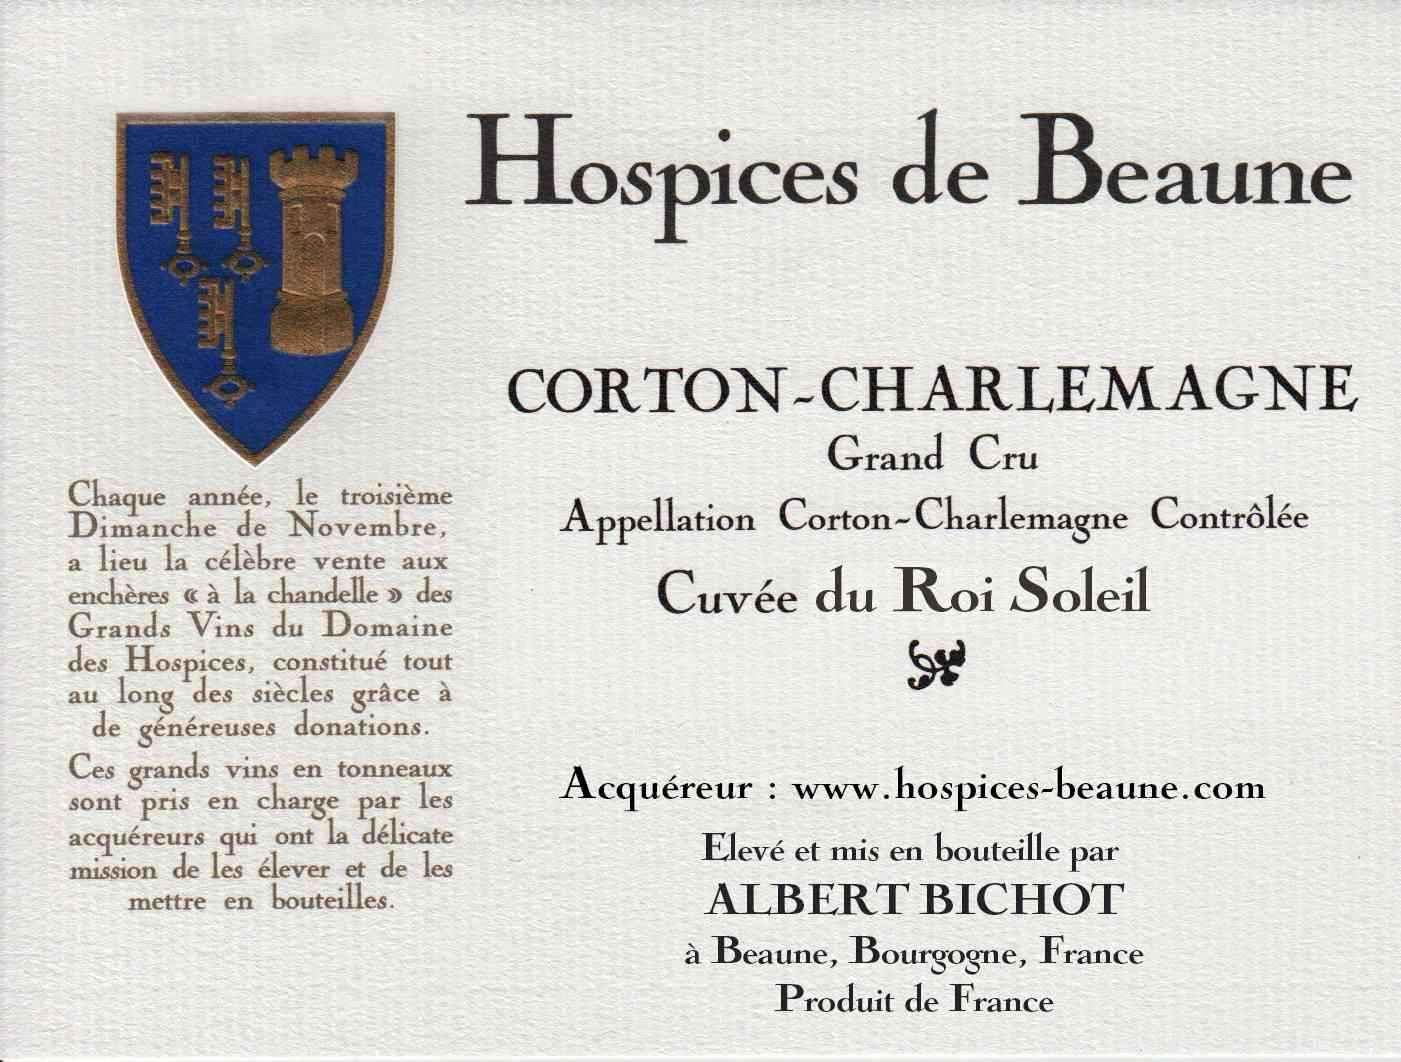 Encheres-auction-HospicesdeBeaune-AlbertBichot-CortonCharlemagne-GrandCru-Cuvee-RoiSoleil